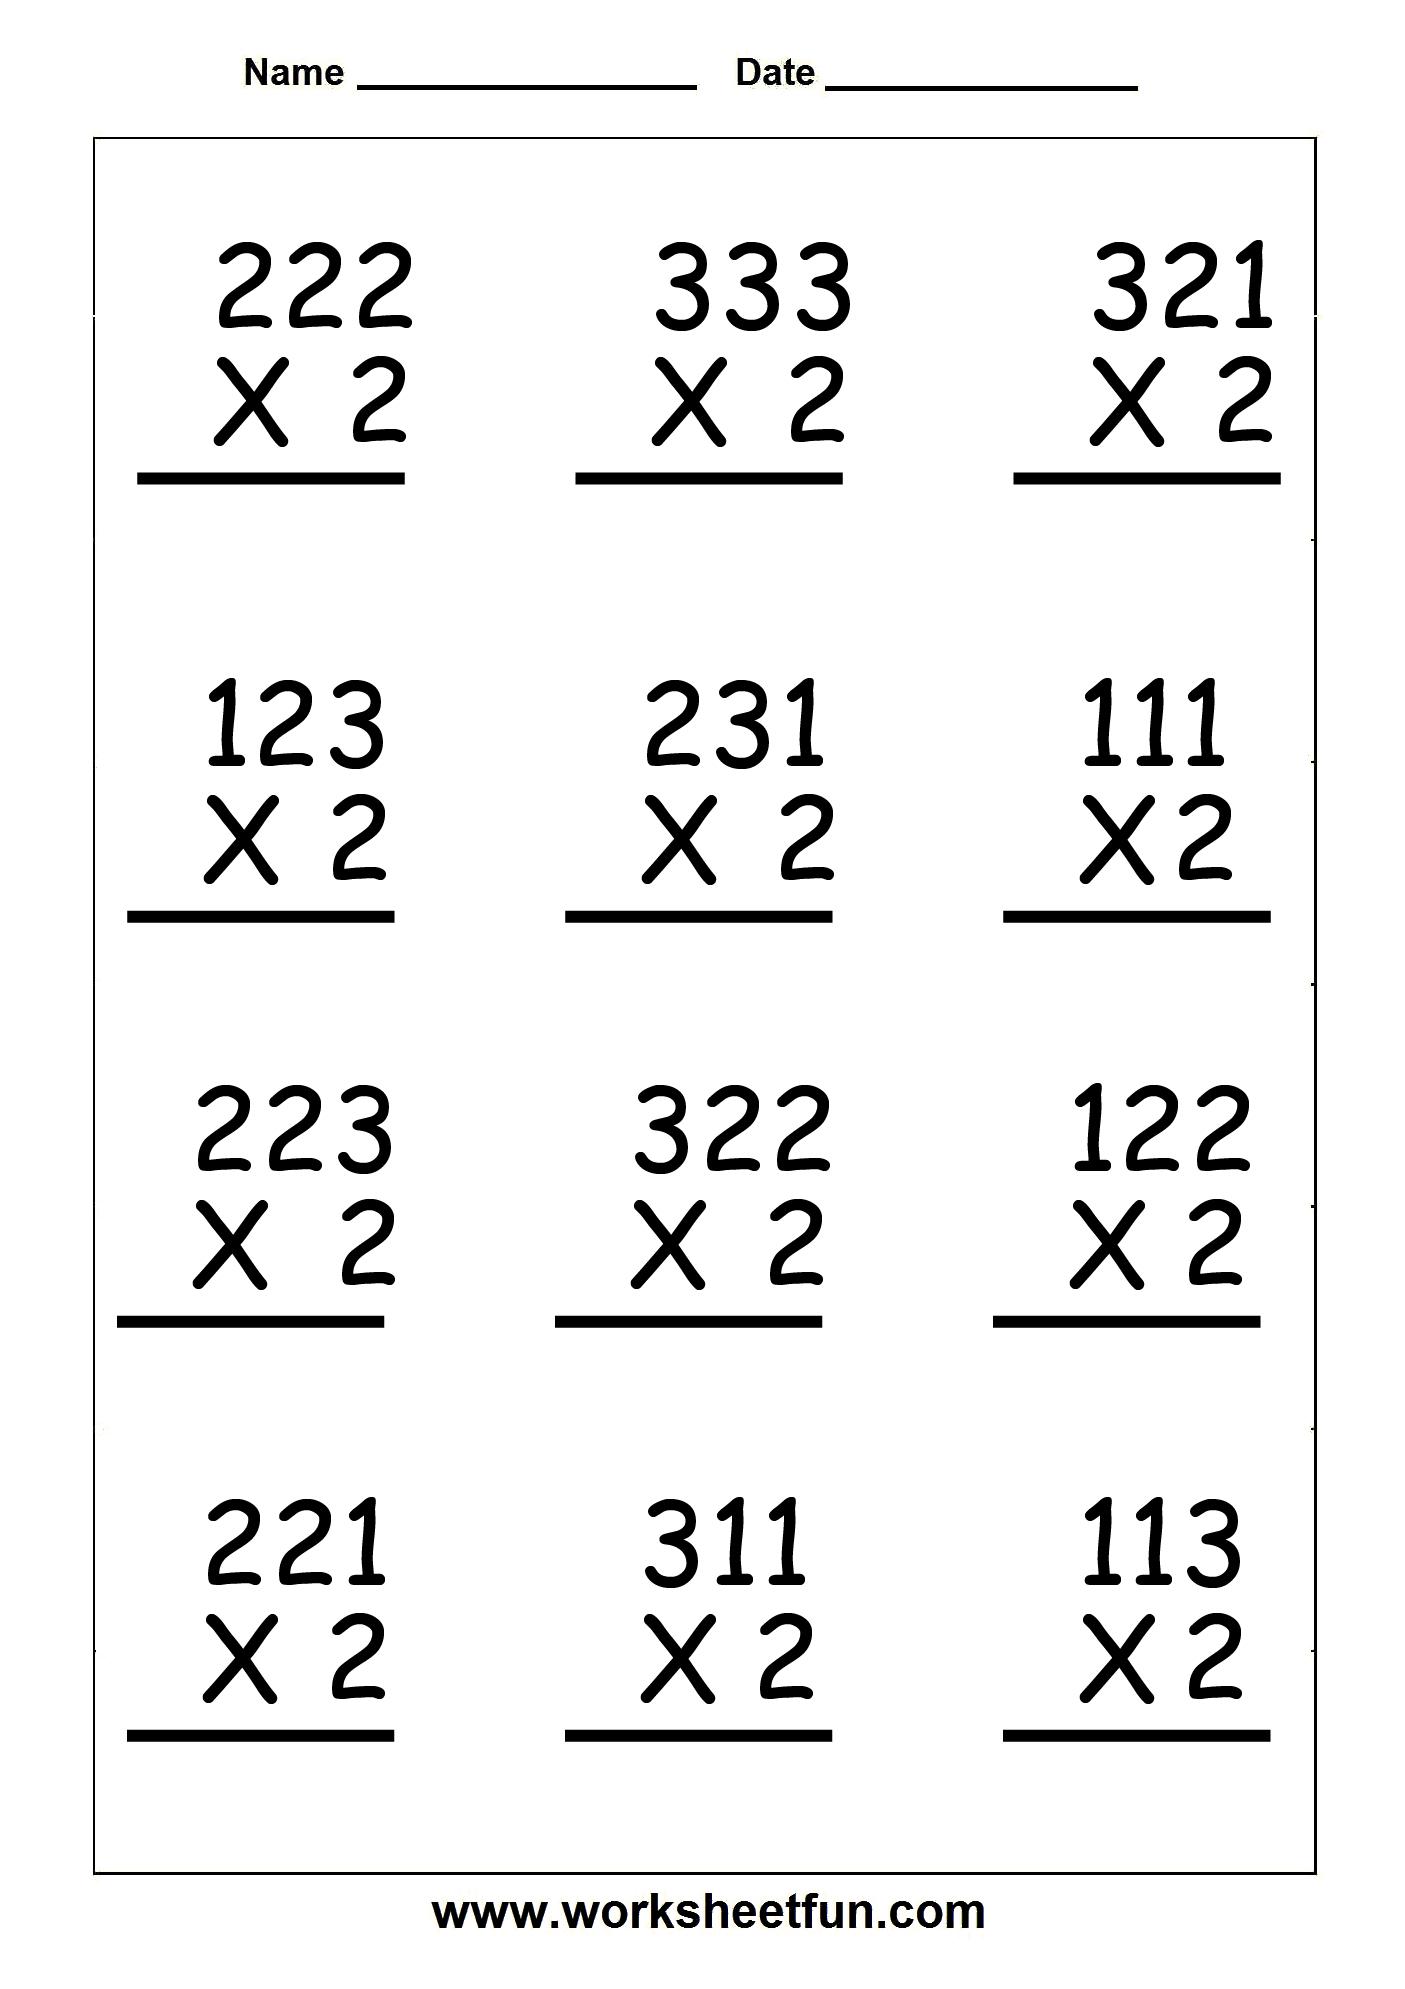 Copy Of Single Digit Multiplication Worksheets - Lessons - Tes Teach | 3 Digit By 1 Digit Multiplication Worksheets Printable